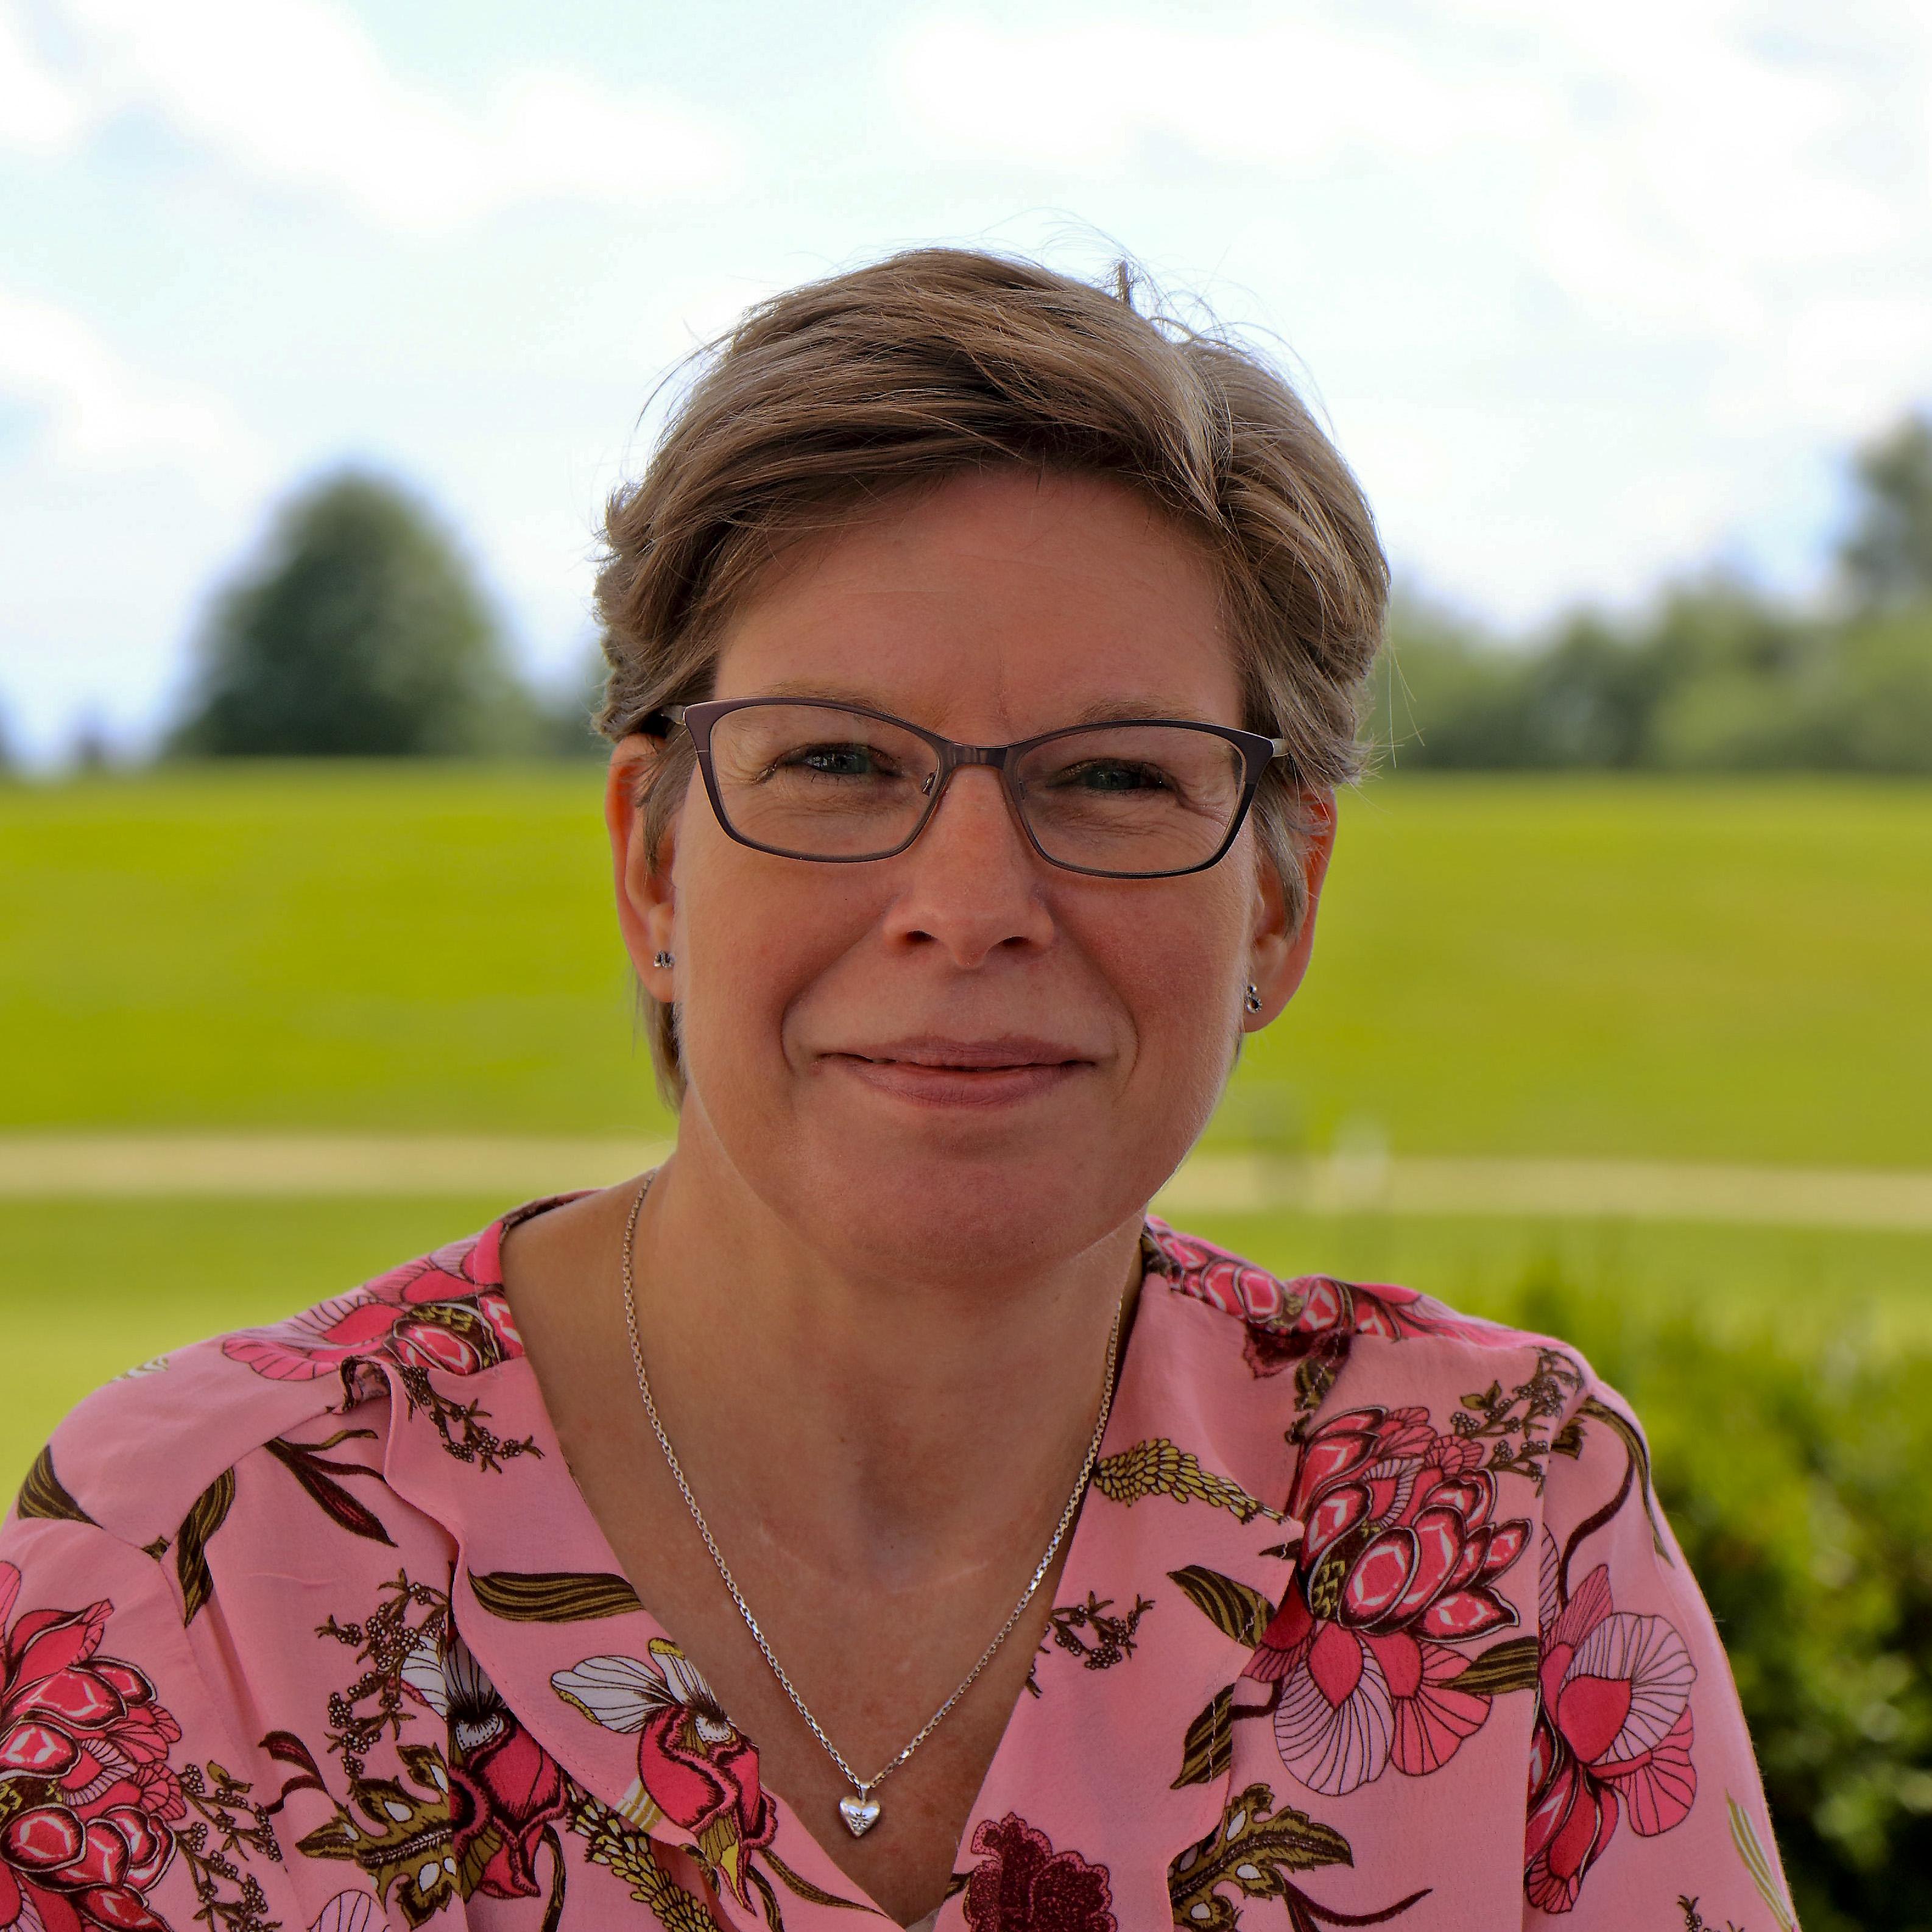 Heidi Henriette Desler